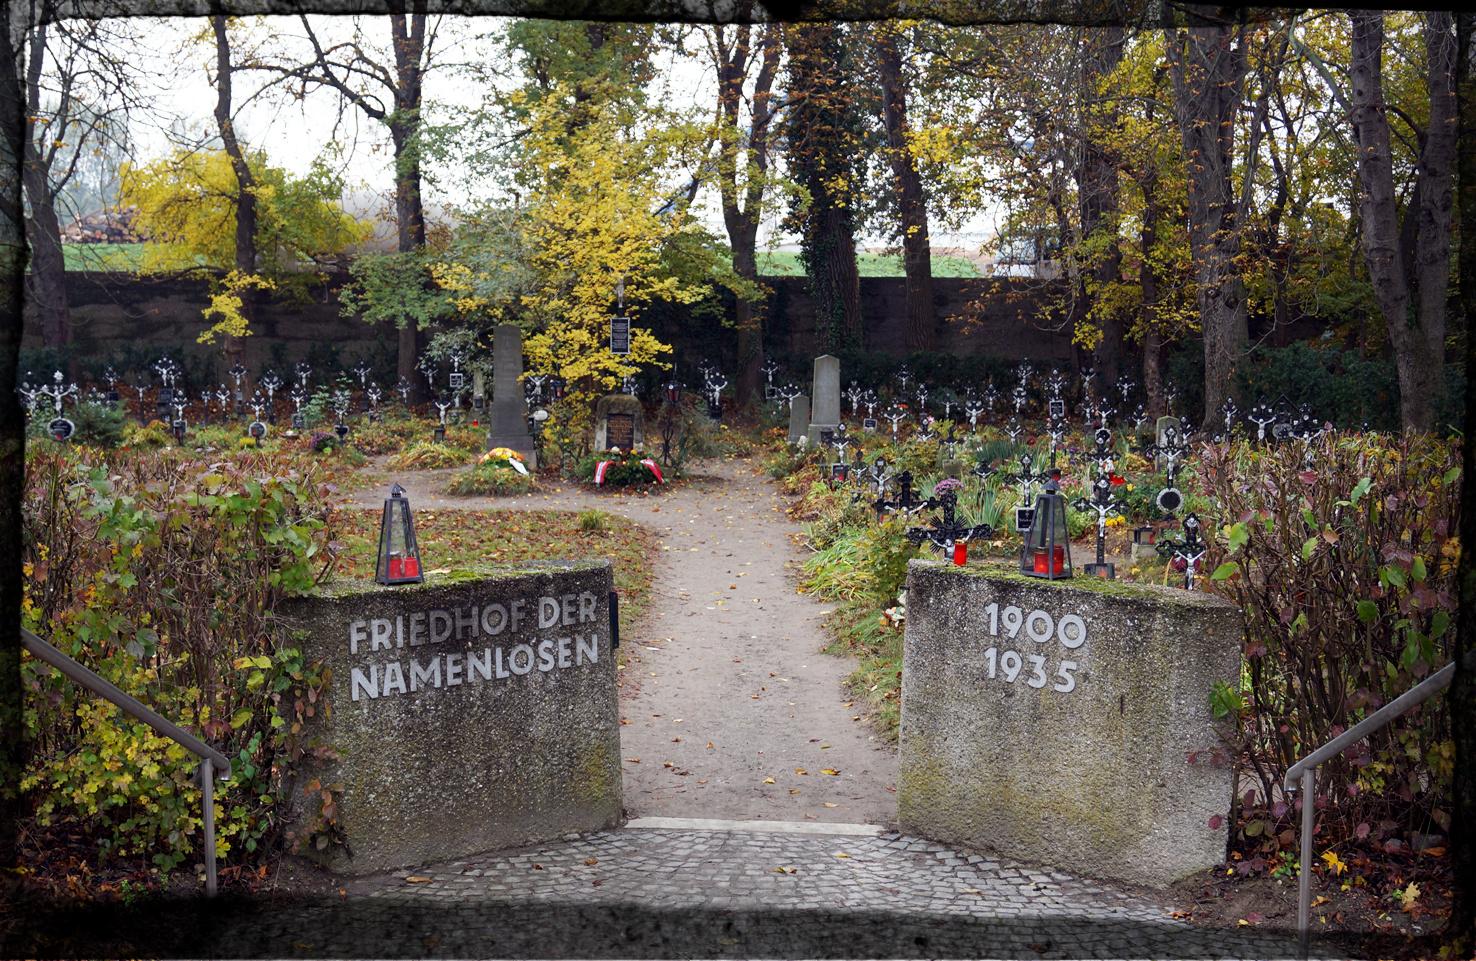 Friedhof_der_Namenlosen